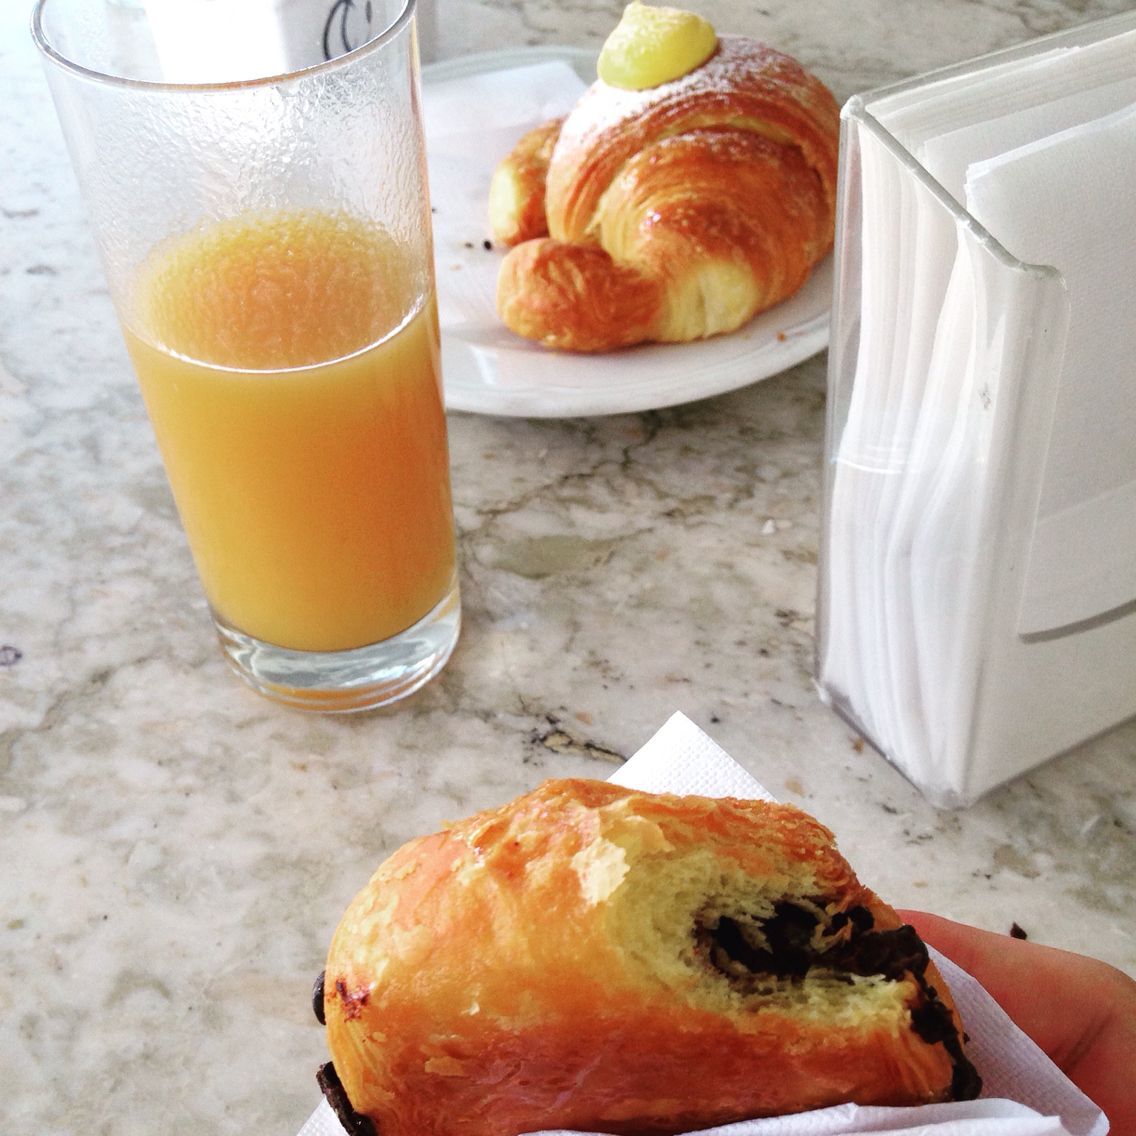 Breakfast  #breakfast #life #delicious #love #bar #relax #kiss #eat #wonderful #fantastic #like #colazione #insieme ✌️